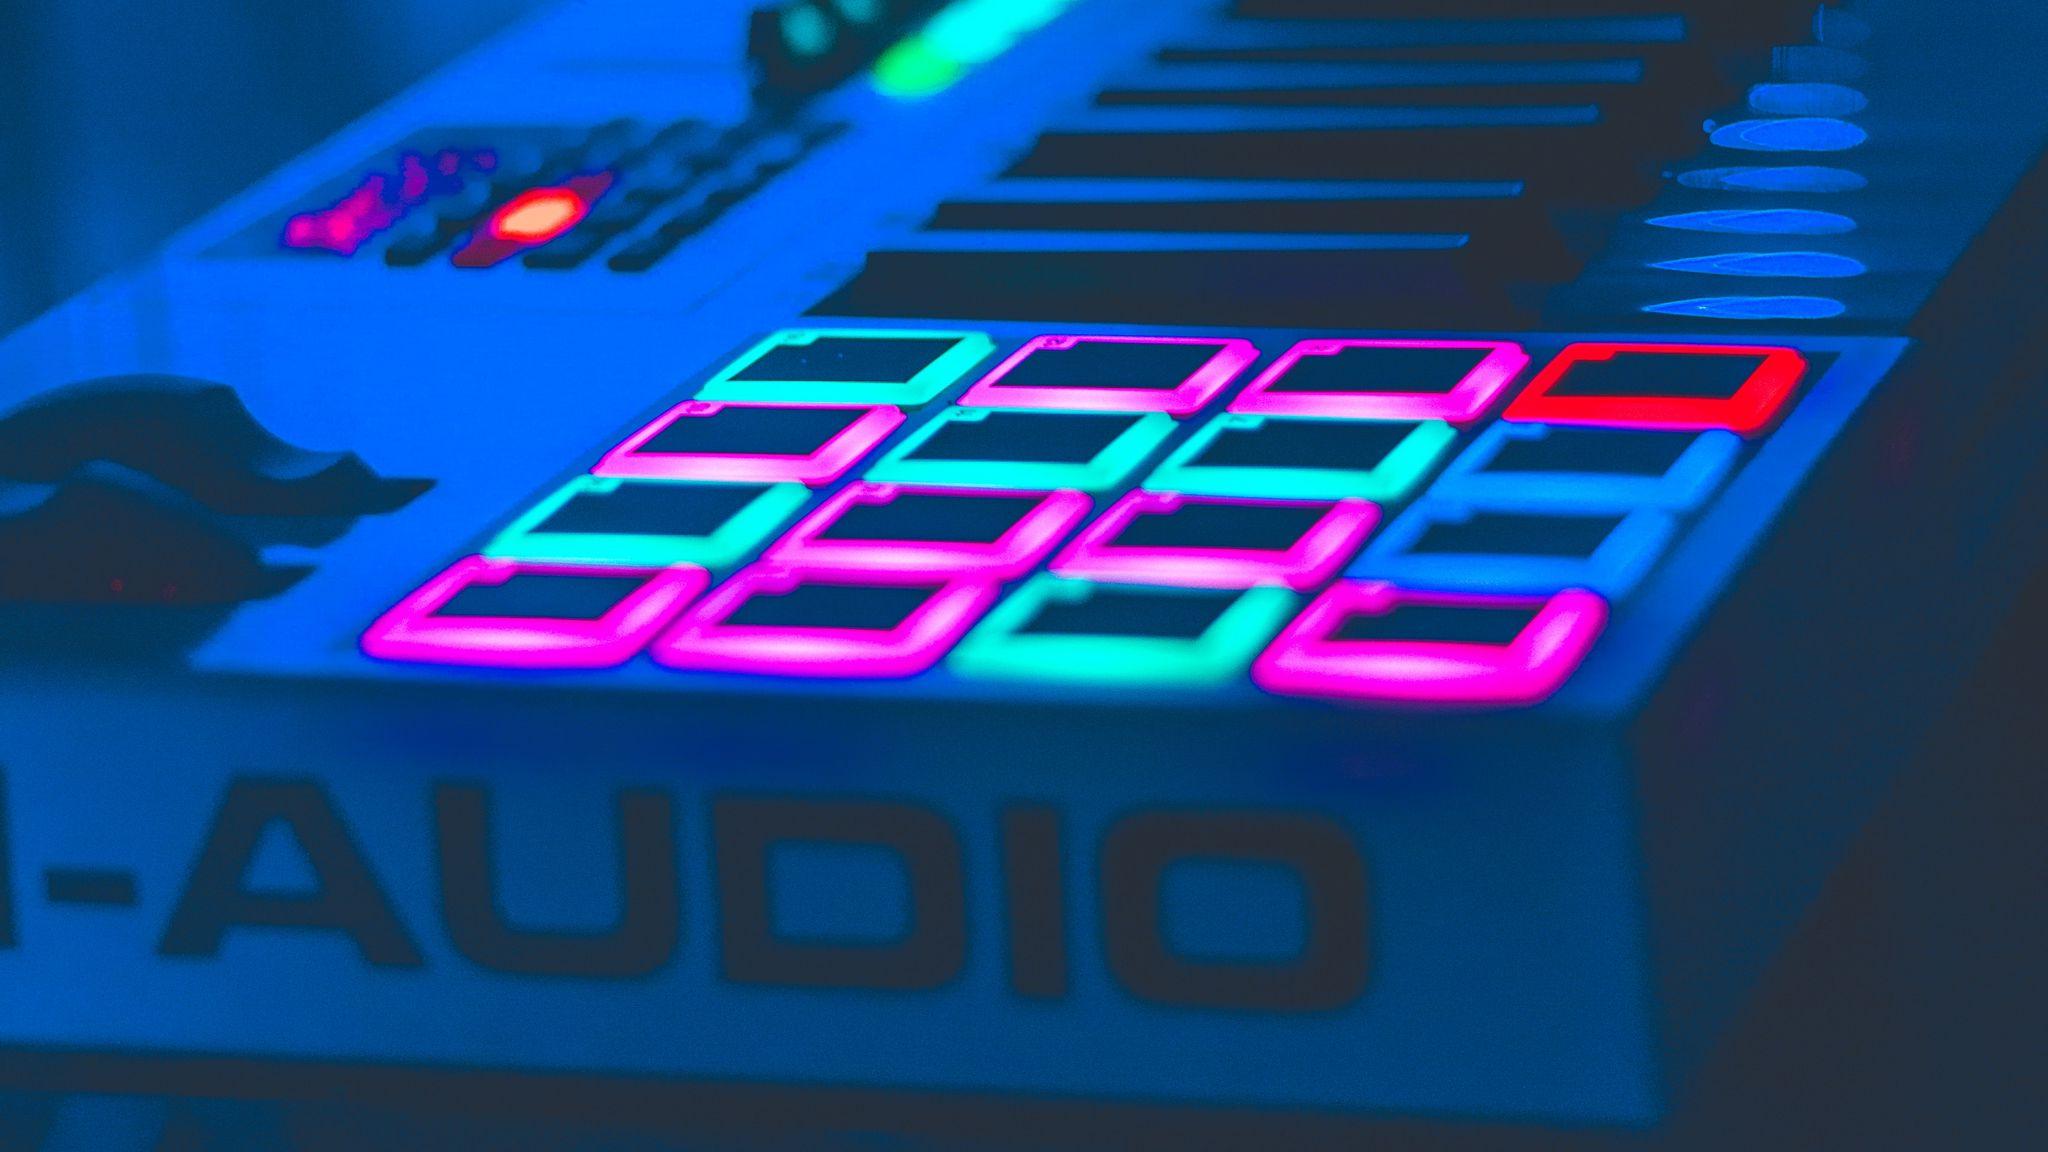 2048x1152 Wallpaper neon, key, instrumental, audio